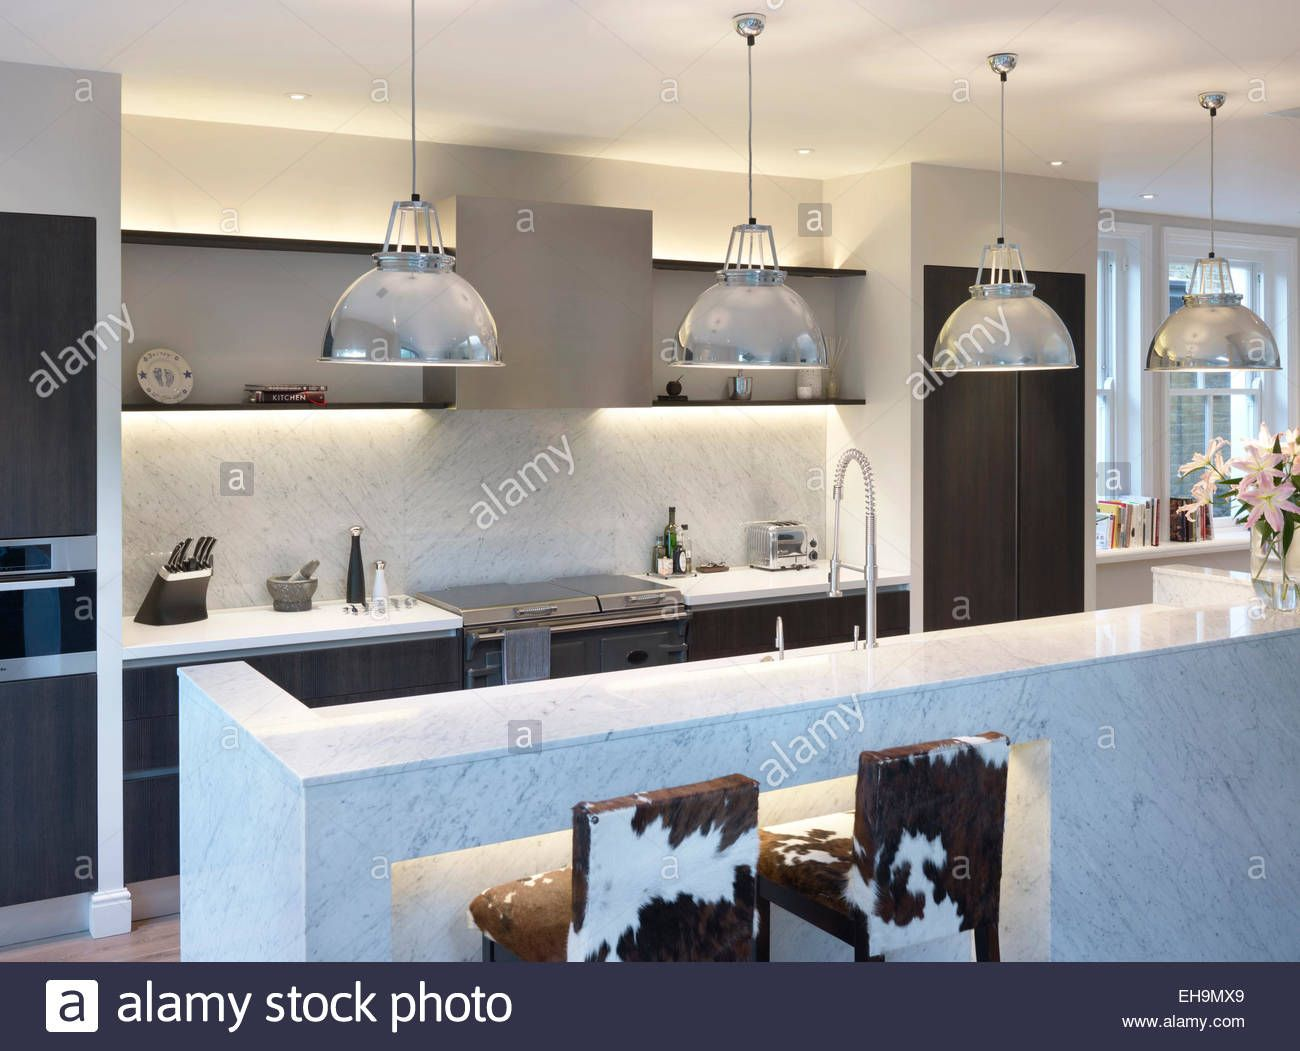 pendant lights over island   Google Search   Kitchen lighting ...